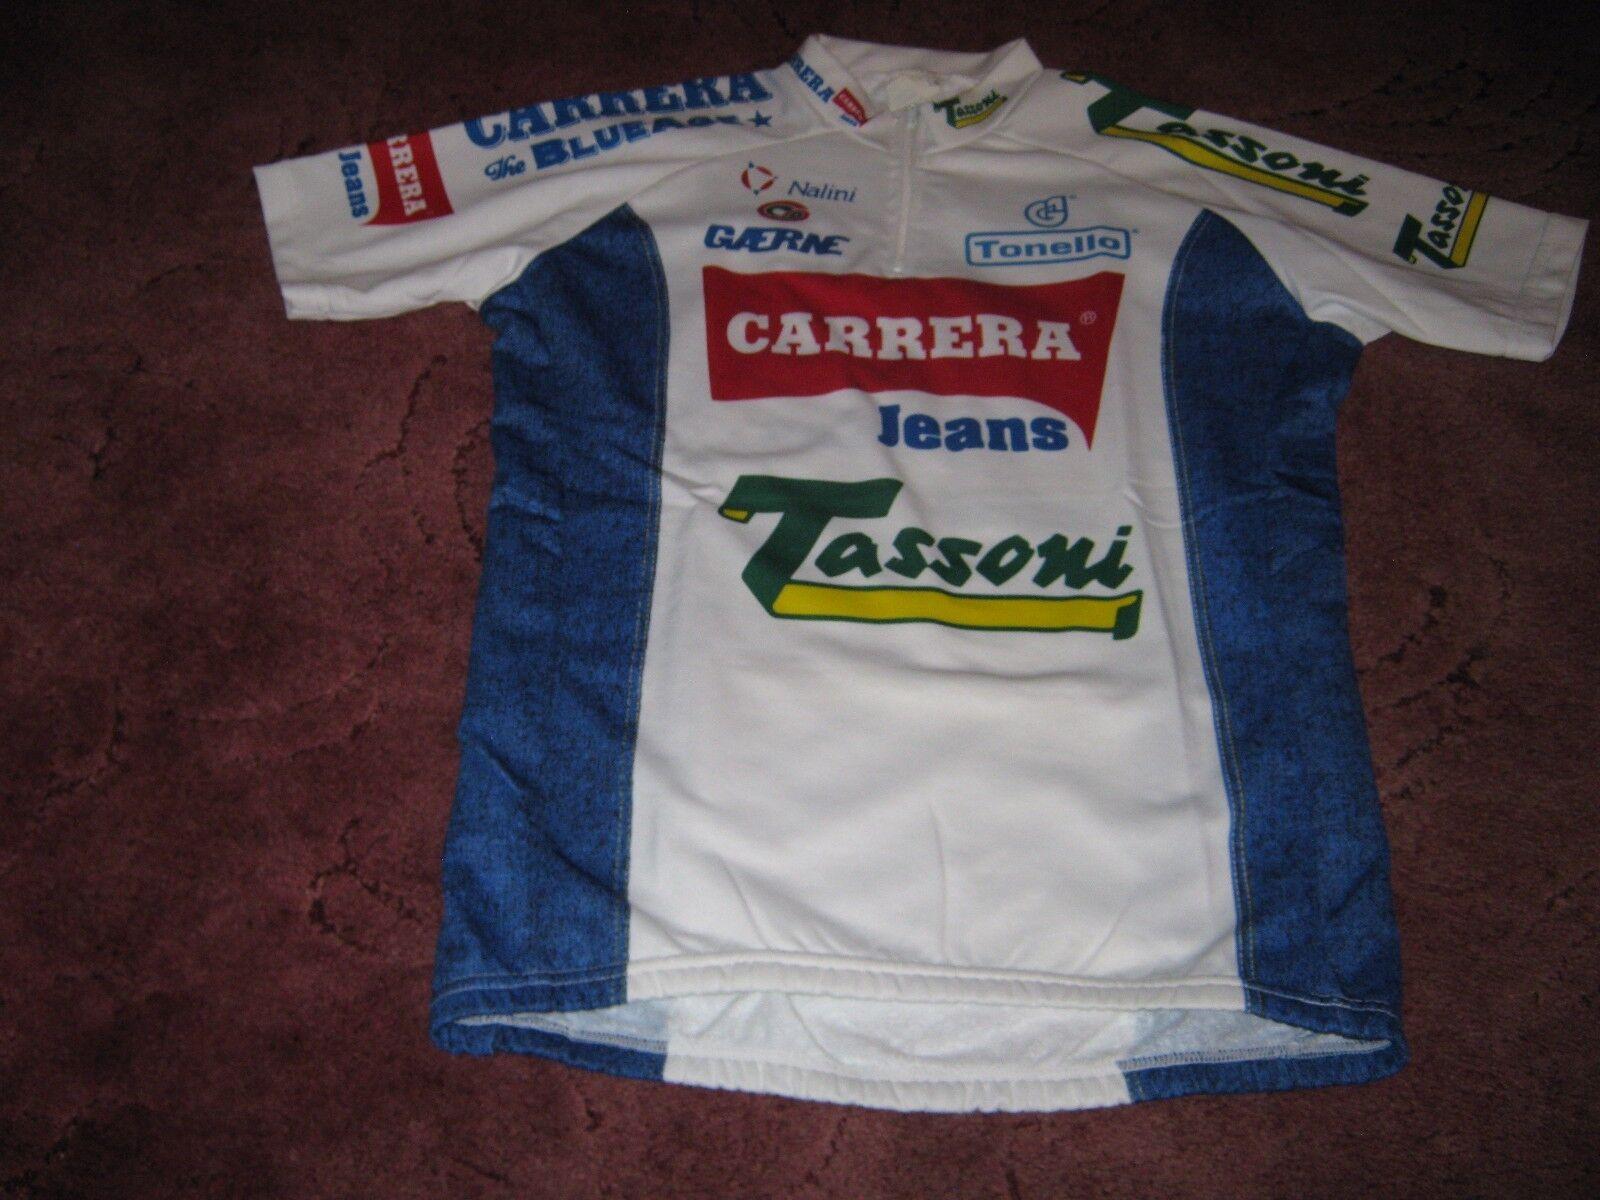 CARRERA TASSONI GAERNE 1994 NALINI ITALIAN  VINTAGE CYCLING JERSEY [5]  at cheap